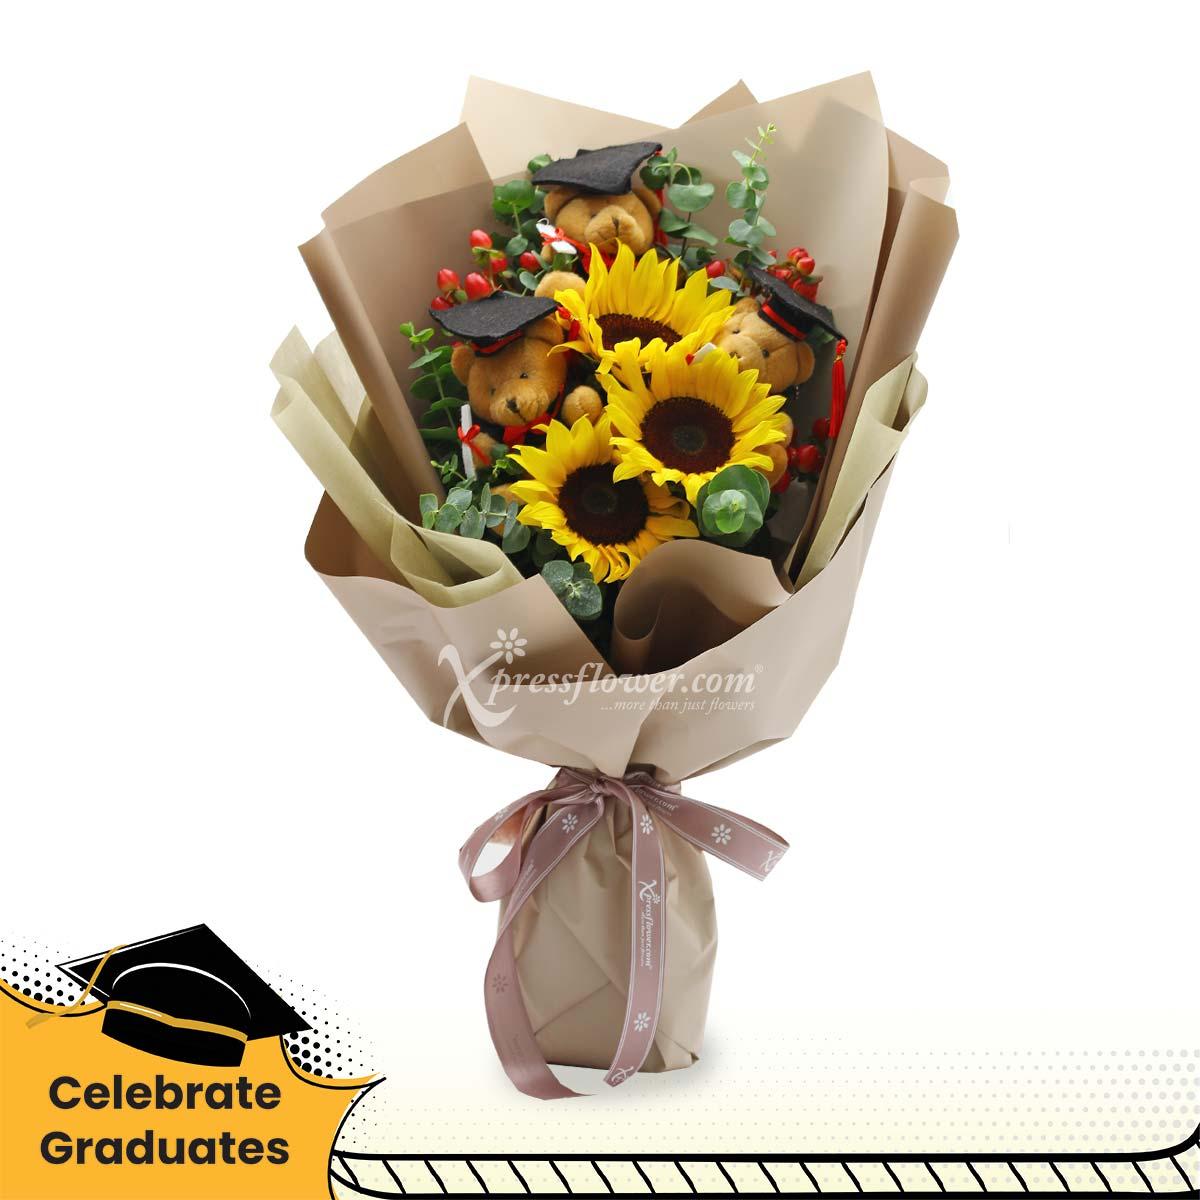 Victorious Applause (3 sunflowers & 3 mini graduation bears)